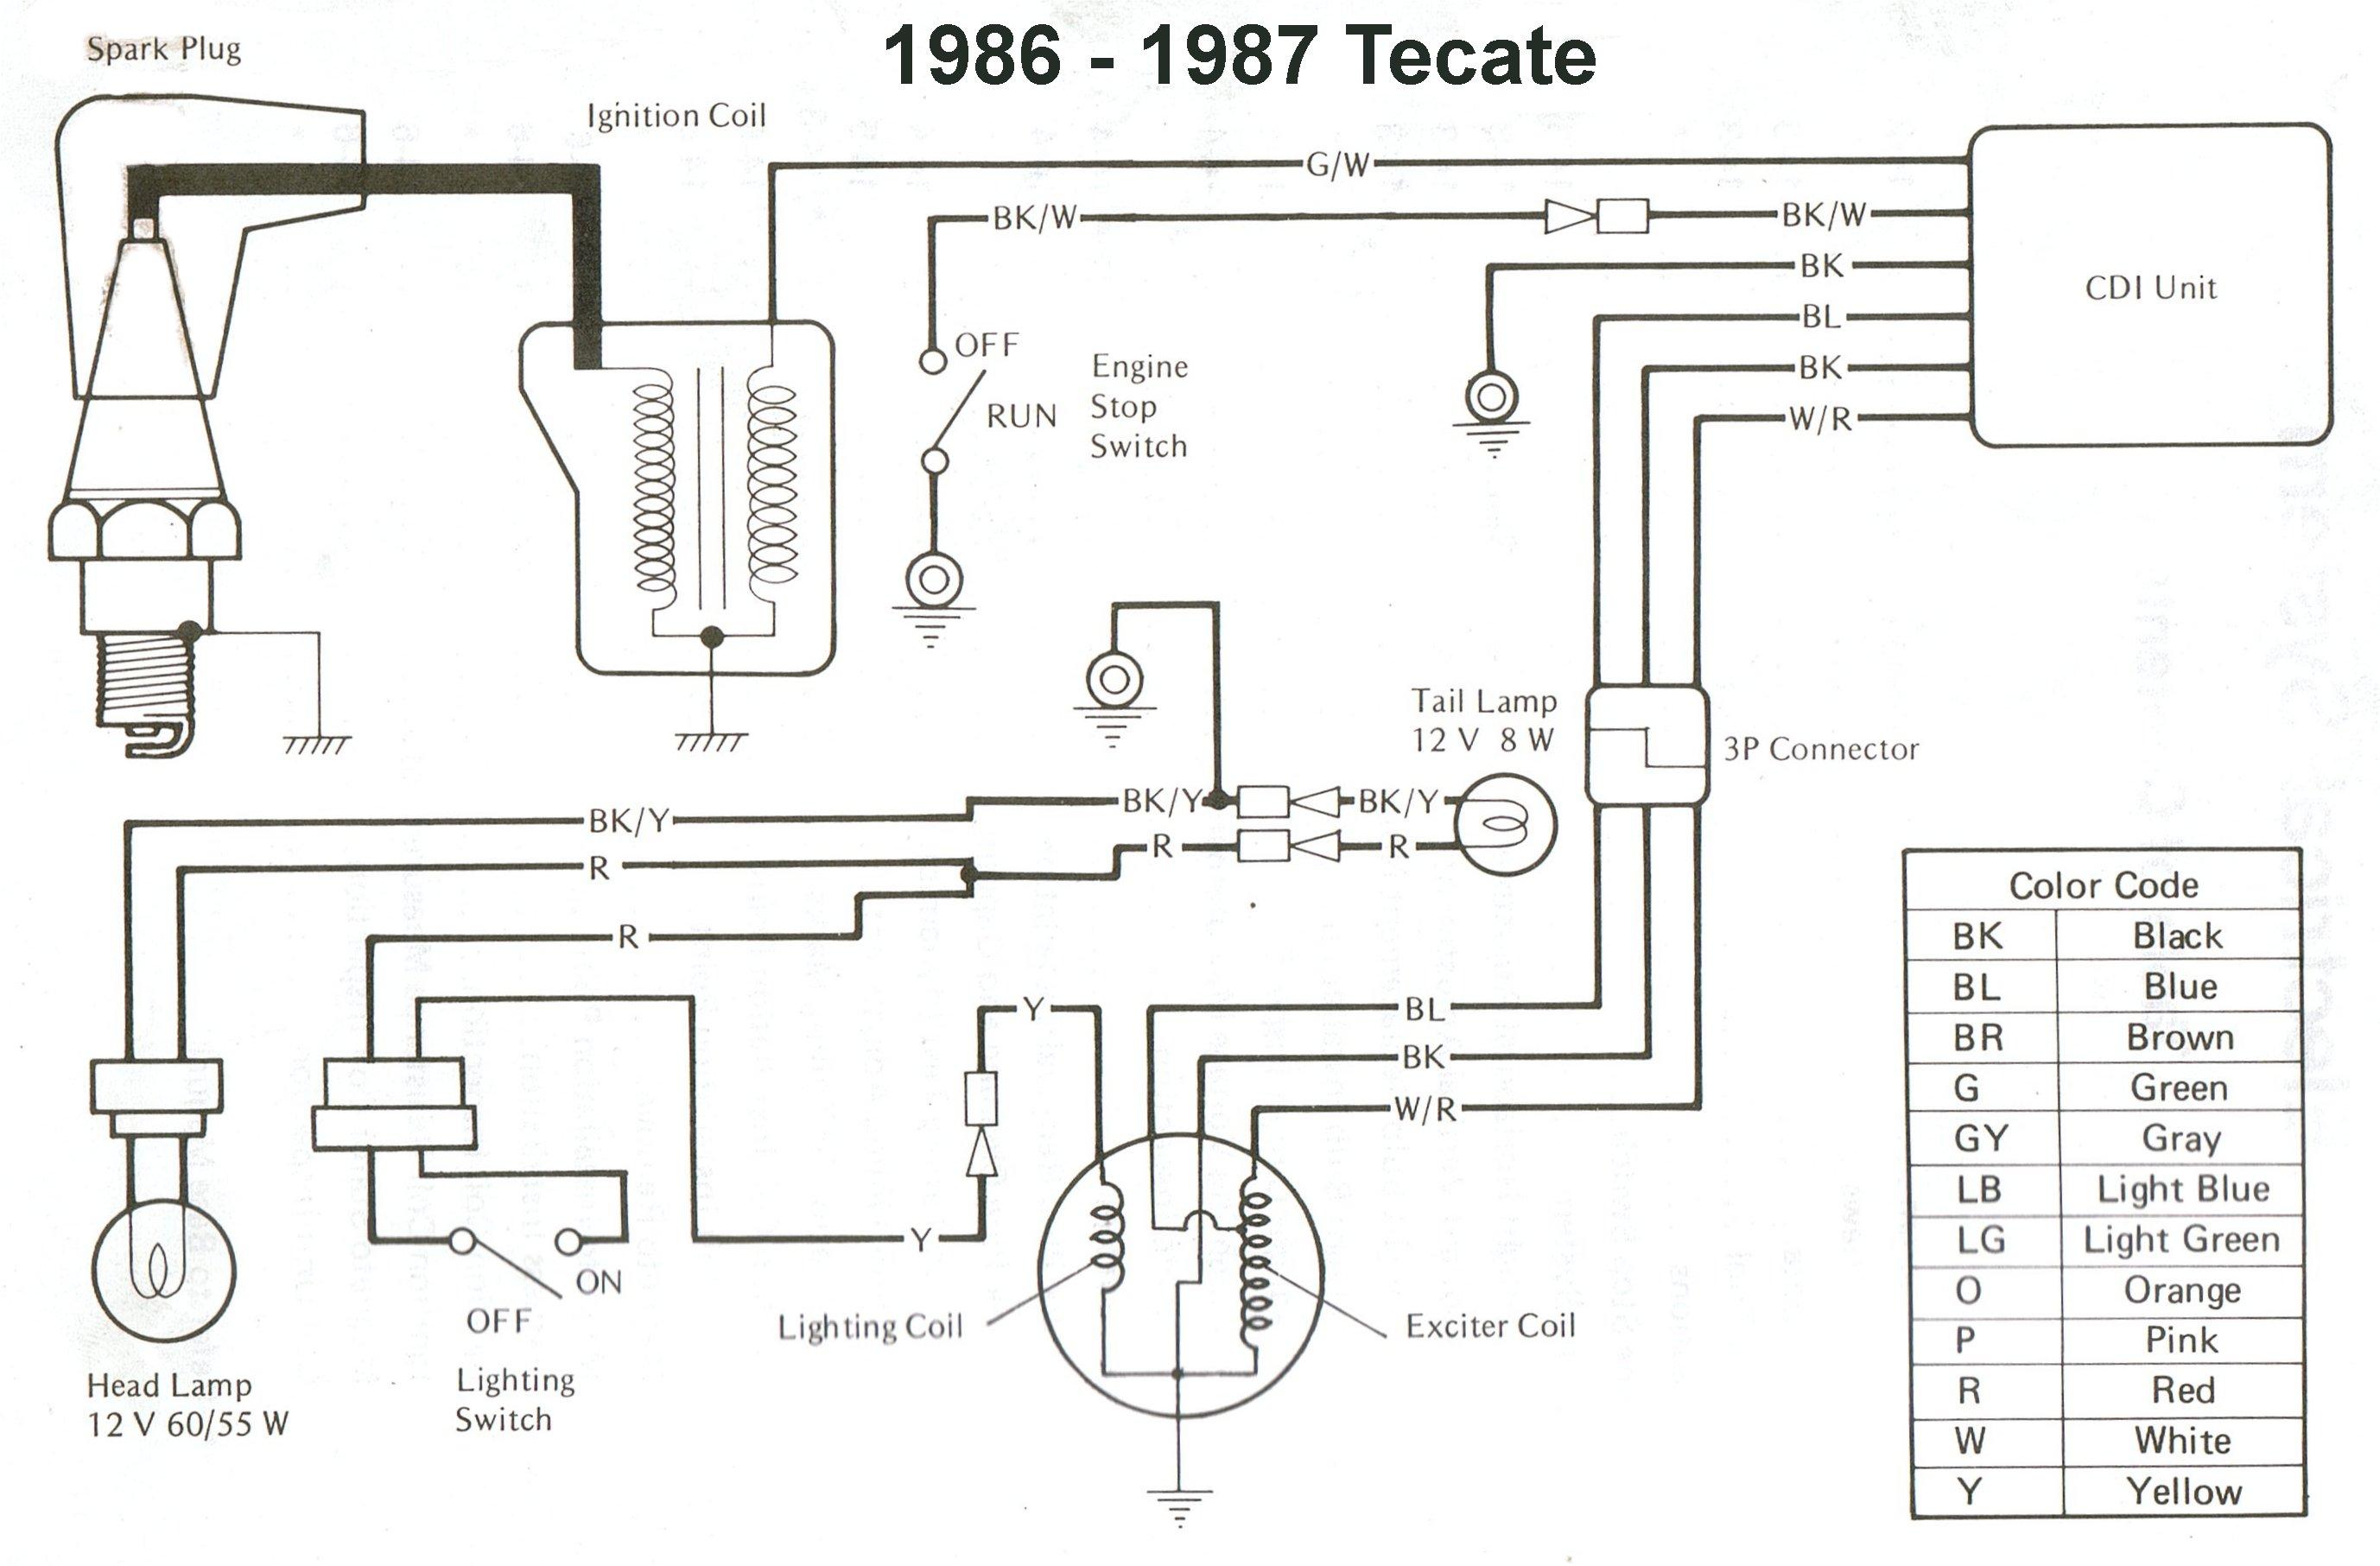 wa250 komatsu wiring diagram wiring library 2001 cr250 trx 250r wiring harness 23 wiring diagram images